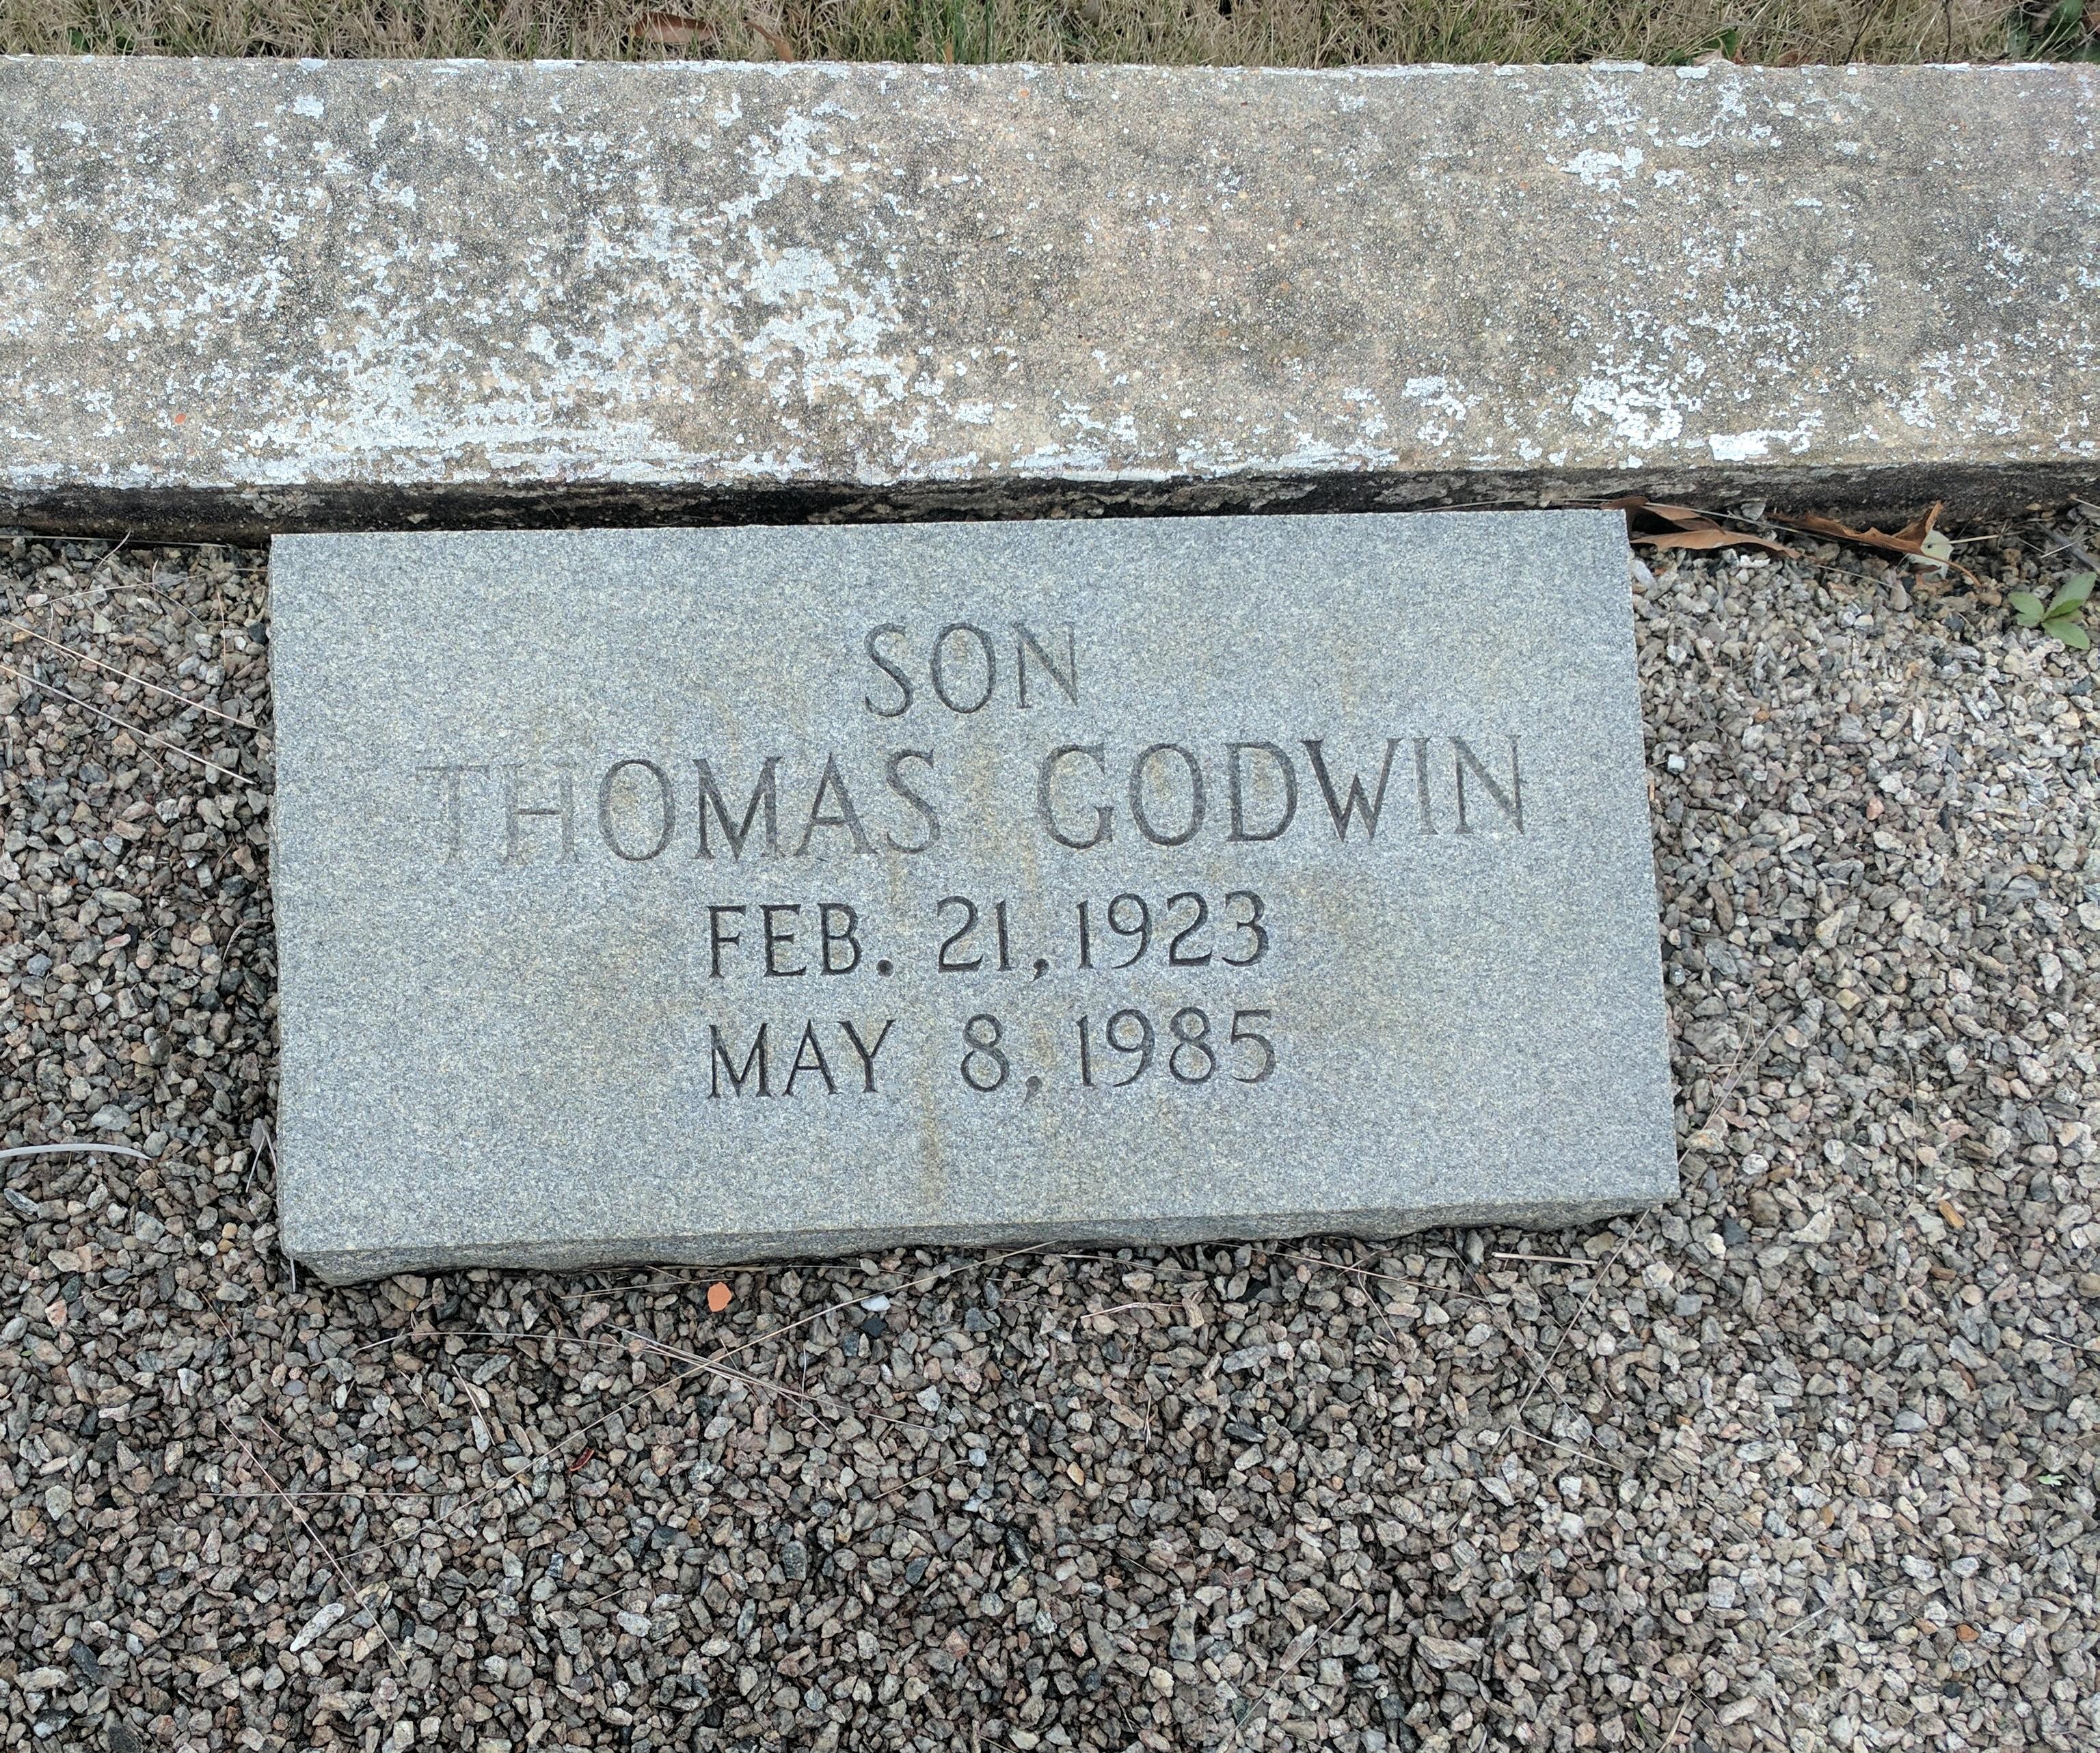 Thomas Godwin Alsobrook, II